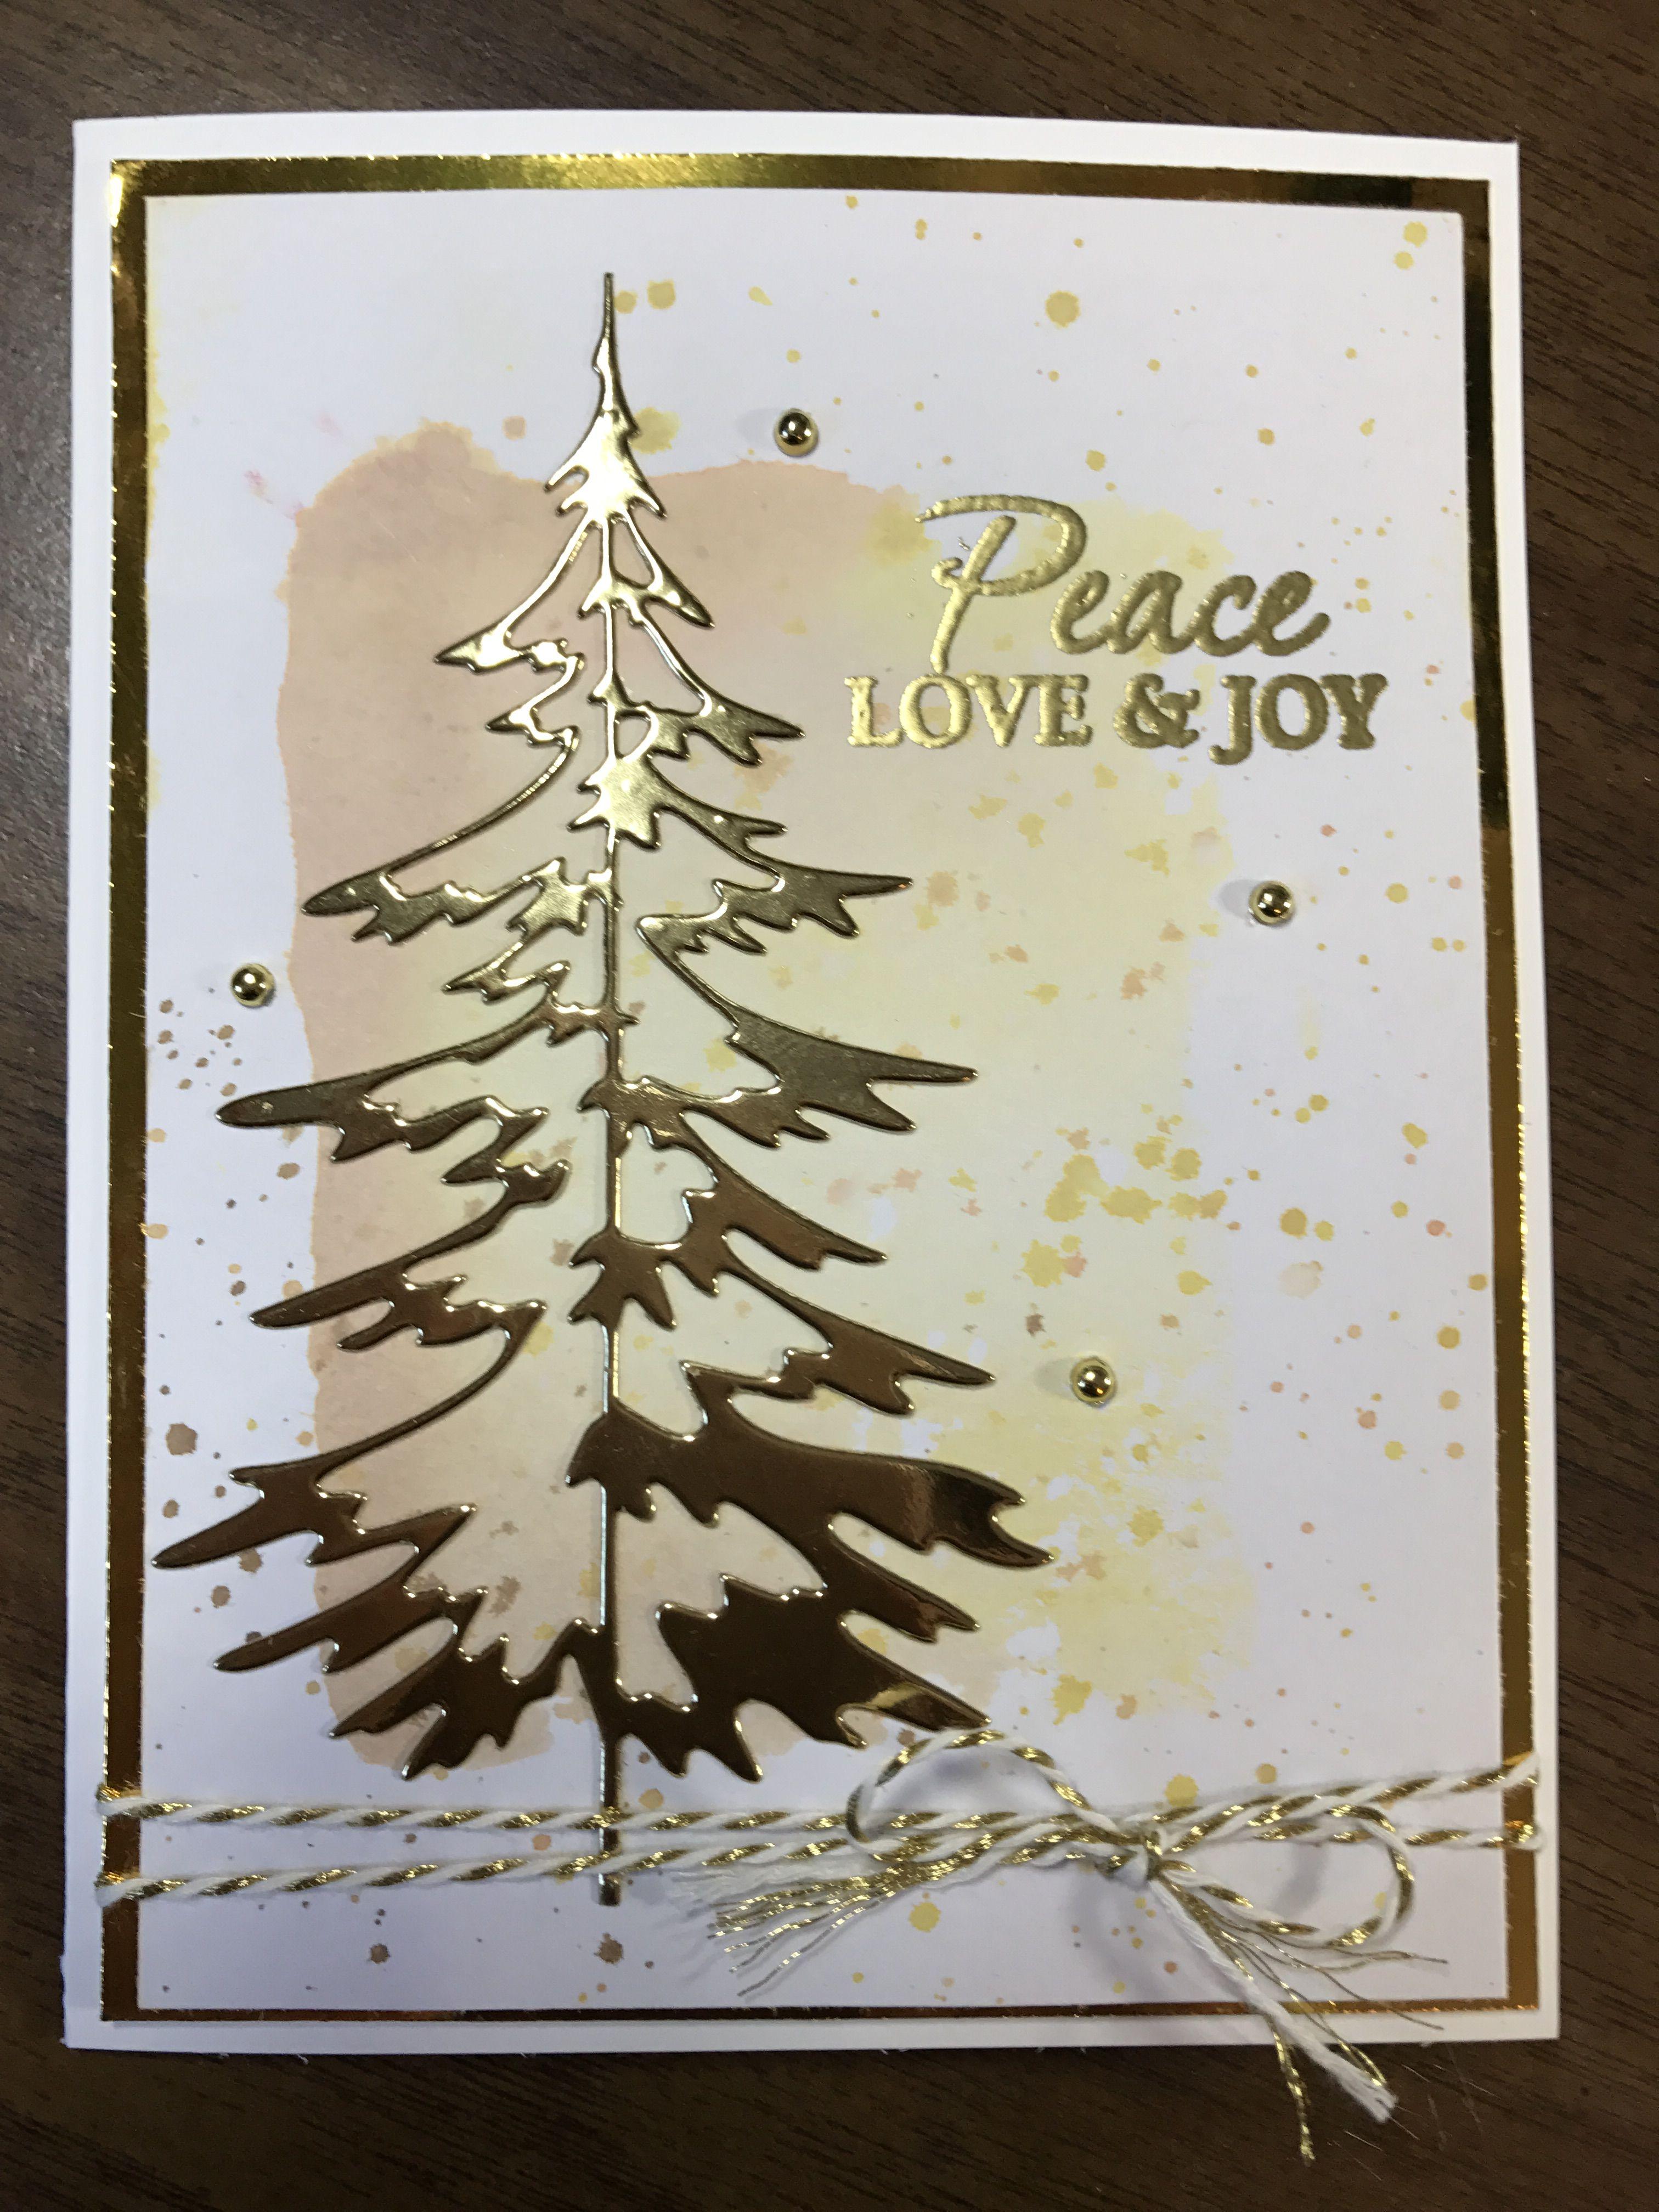 Tim Holtz Woodlands die. Christmas card. | My card creations ...